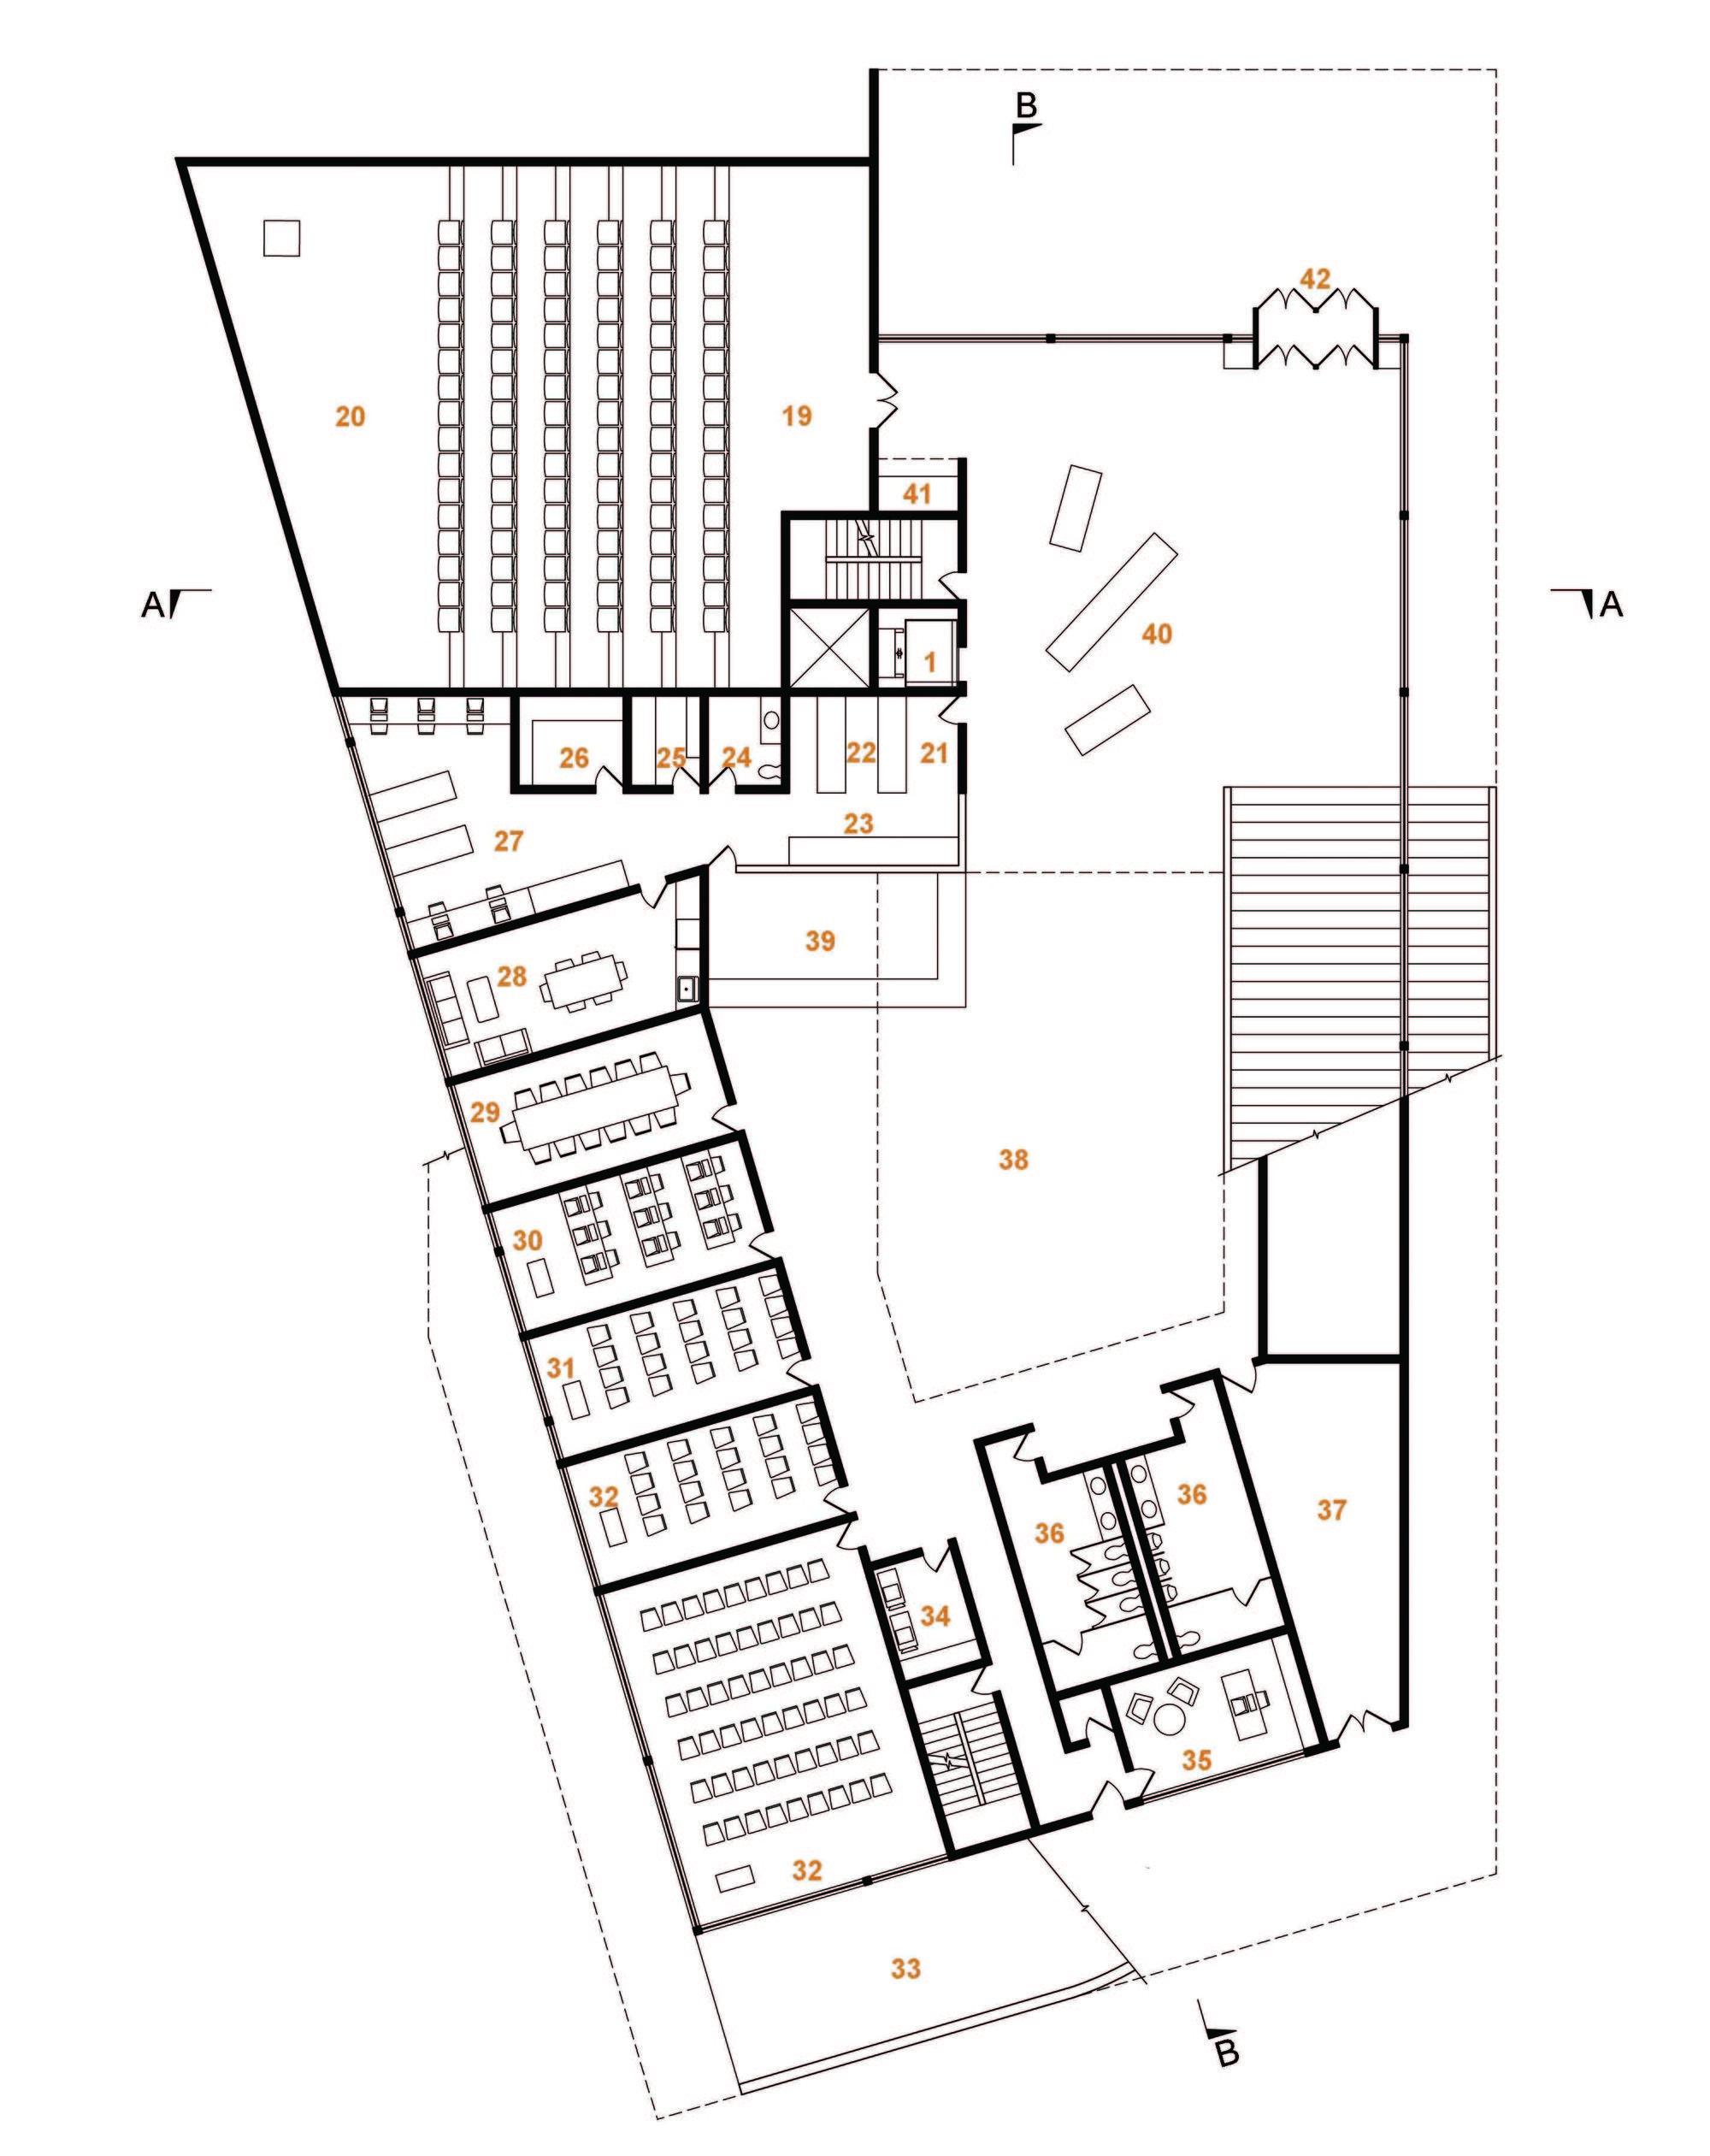 Gallery Of Daegu Gosan Public Library Competition Entry Martin Fenlon Architecture